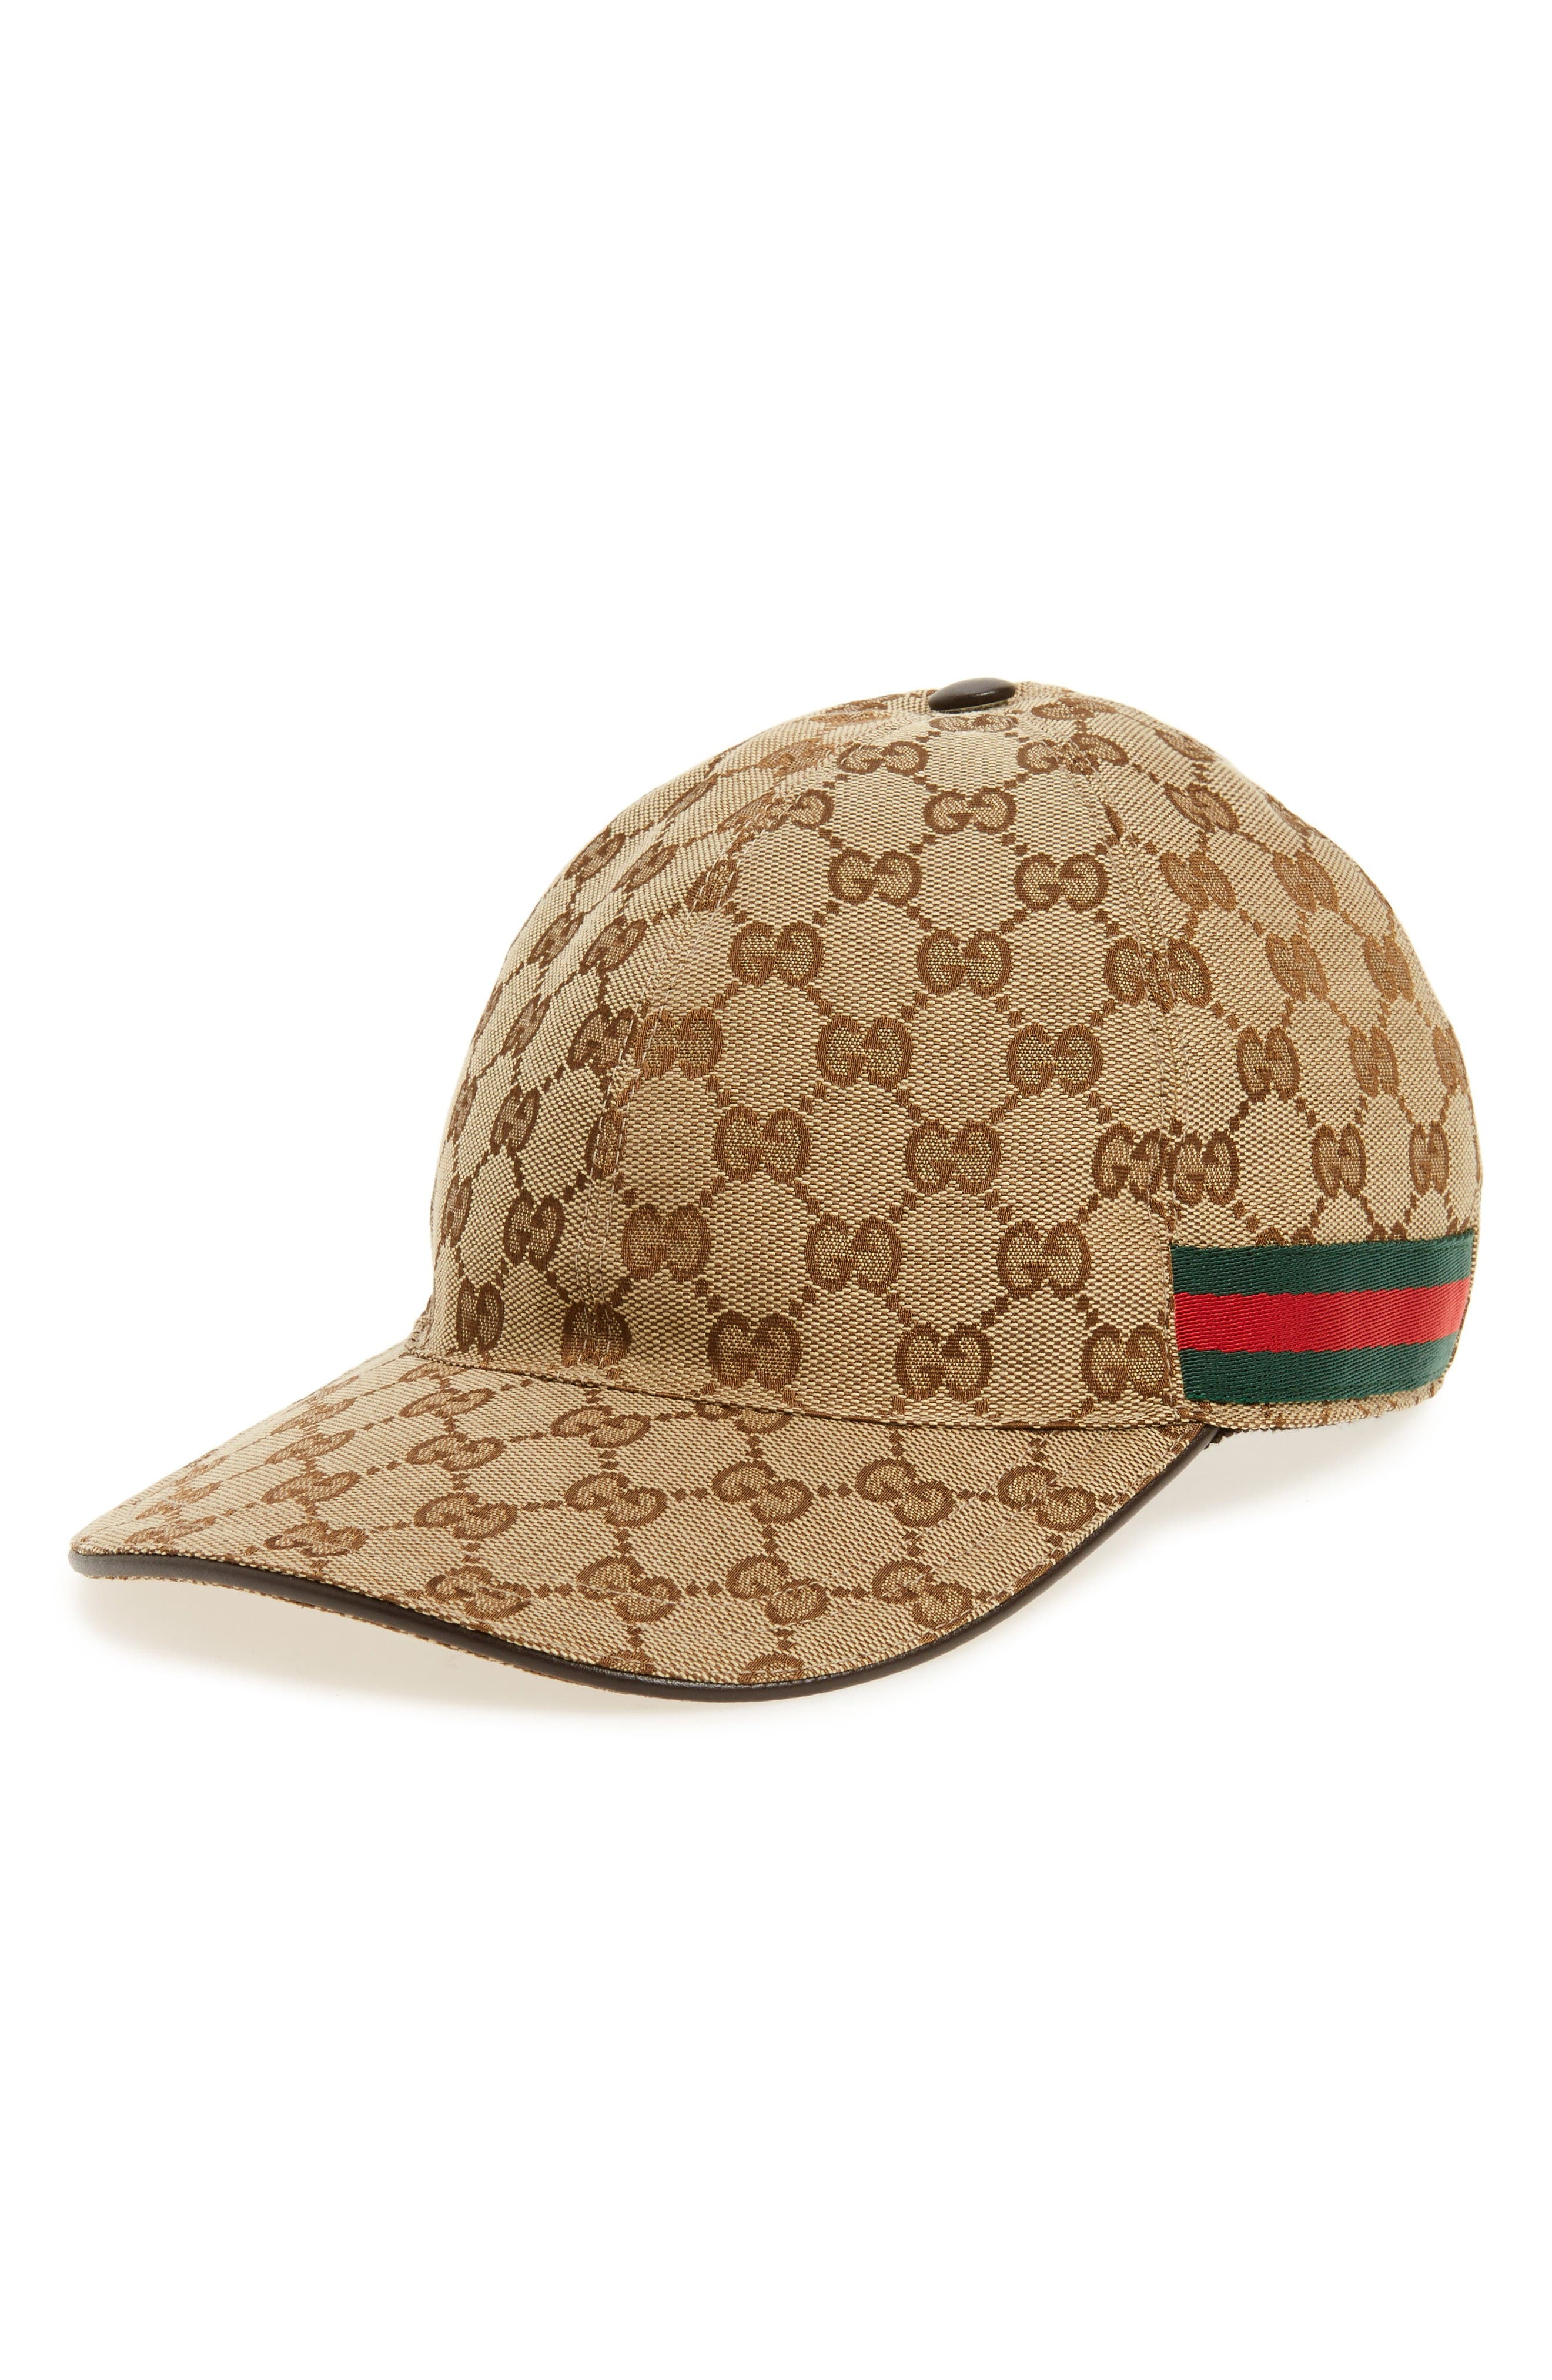 893c7c12f Men's Gucci Hats, Hats for Men | Nordstrom